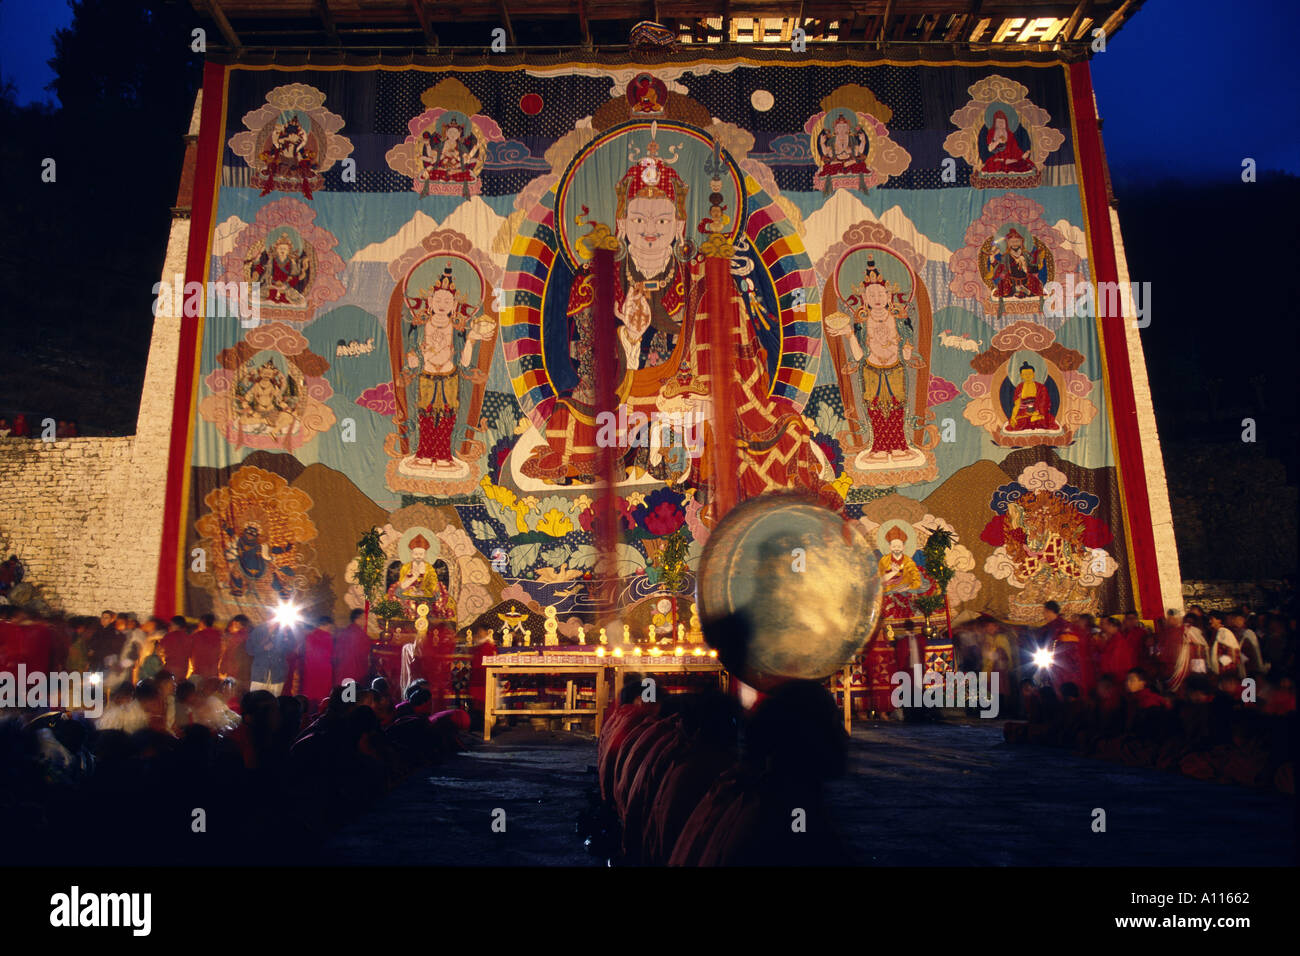 Buddhist monks at Paro Dzong with painted Thanka Paro Bhutan - Stock Image